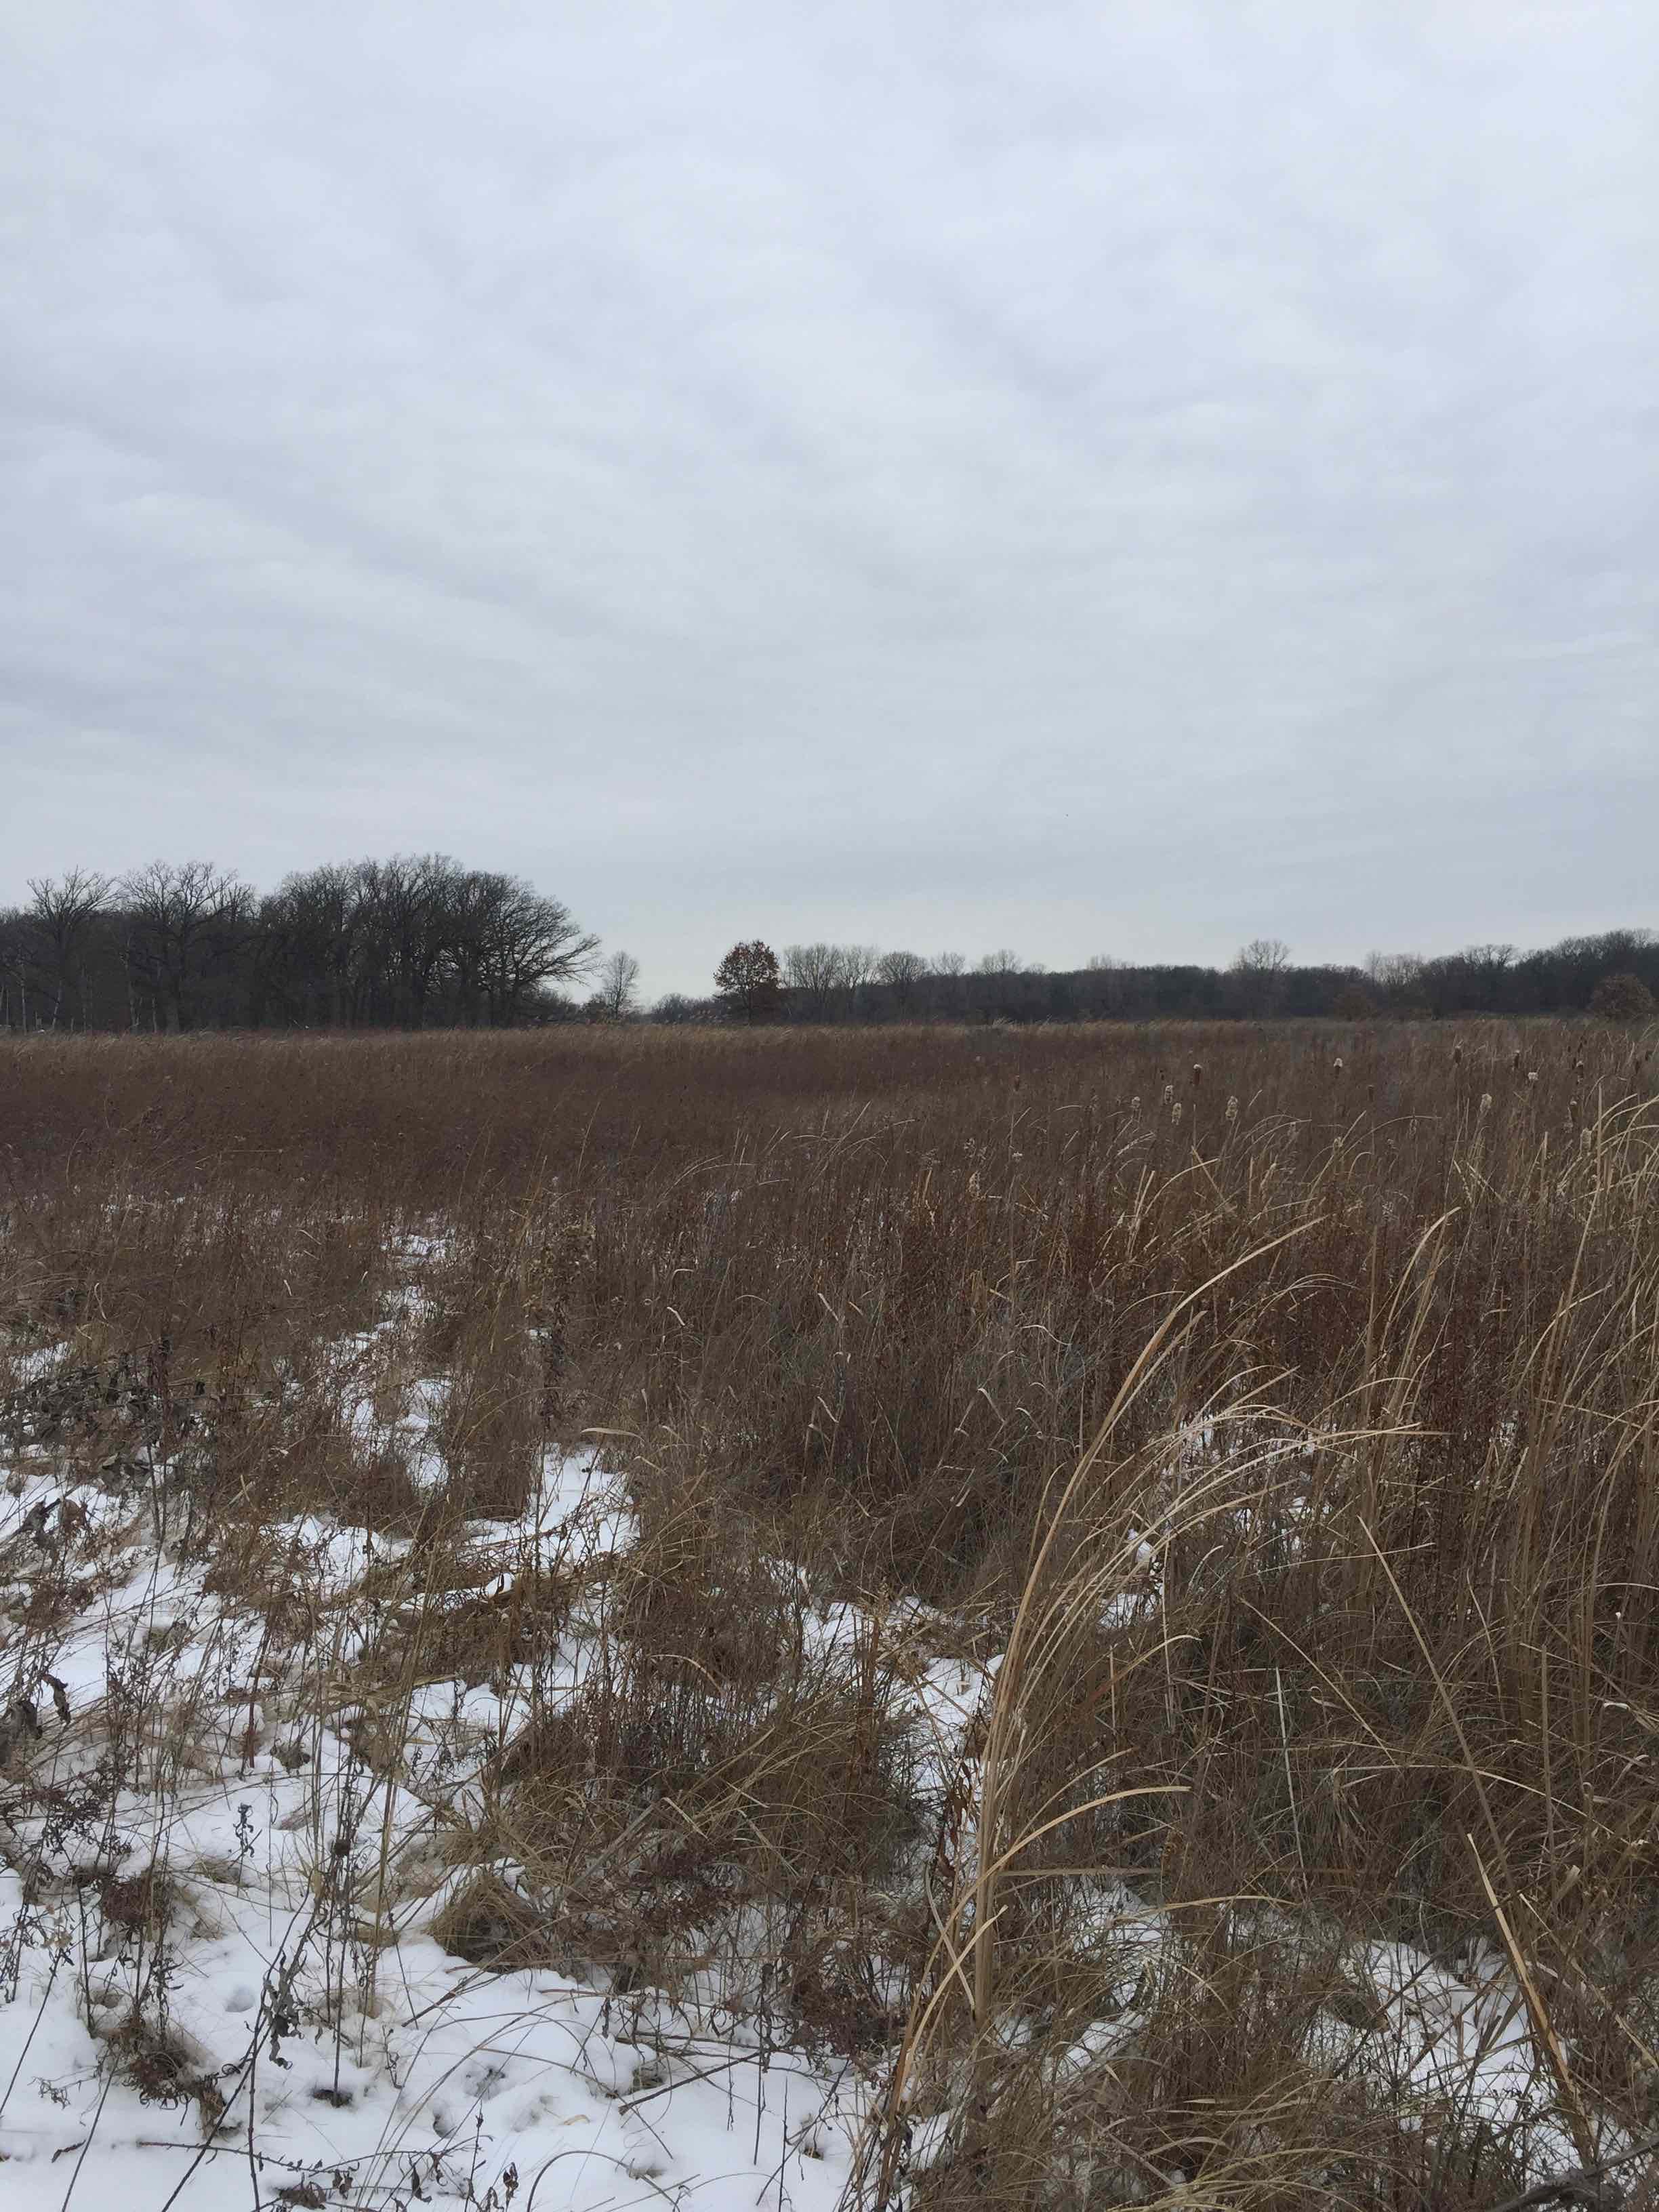 Nature Preserve actual photo showing grasses and oak treeline in the horizon.